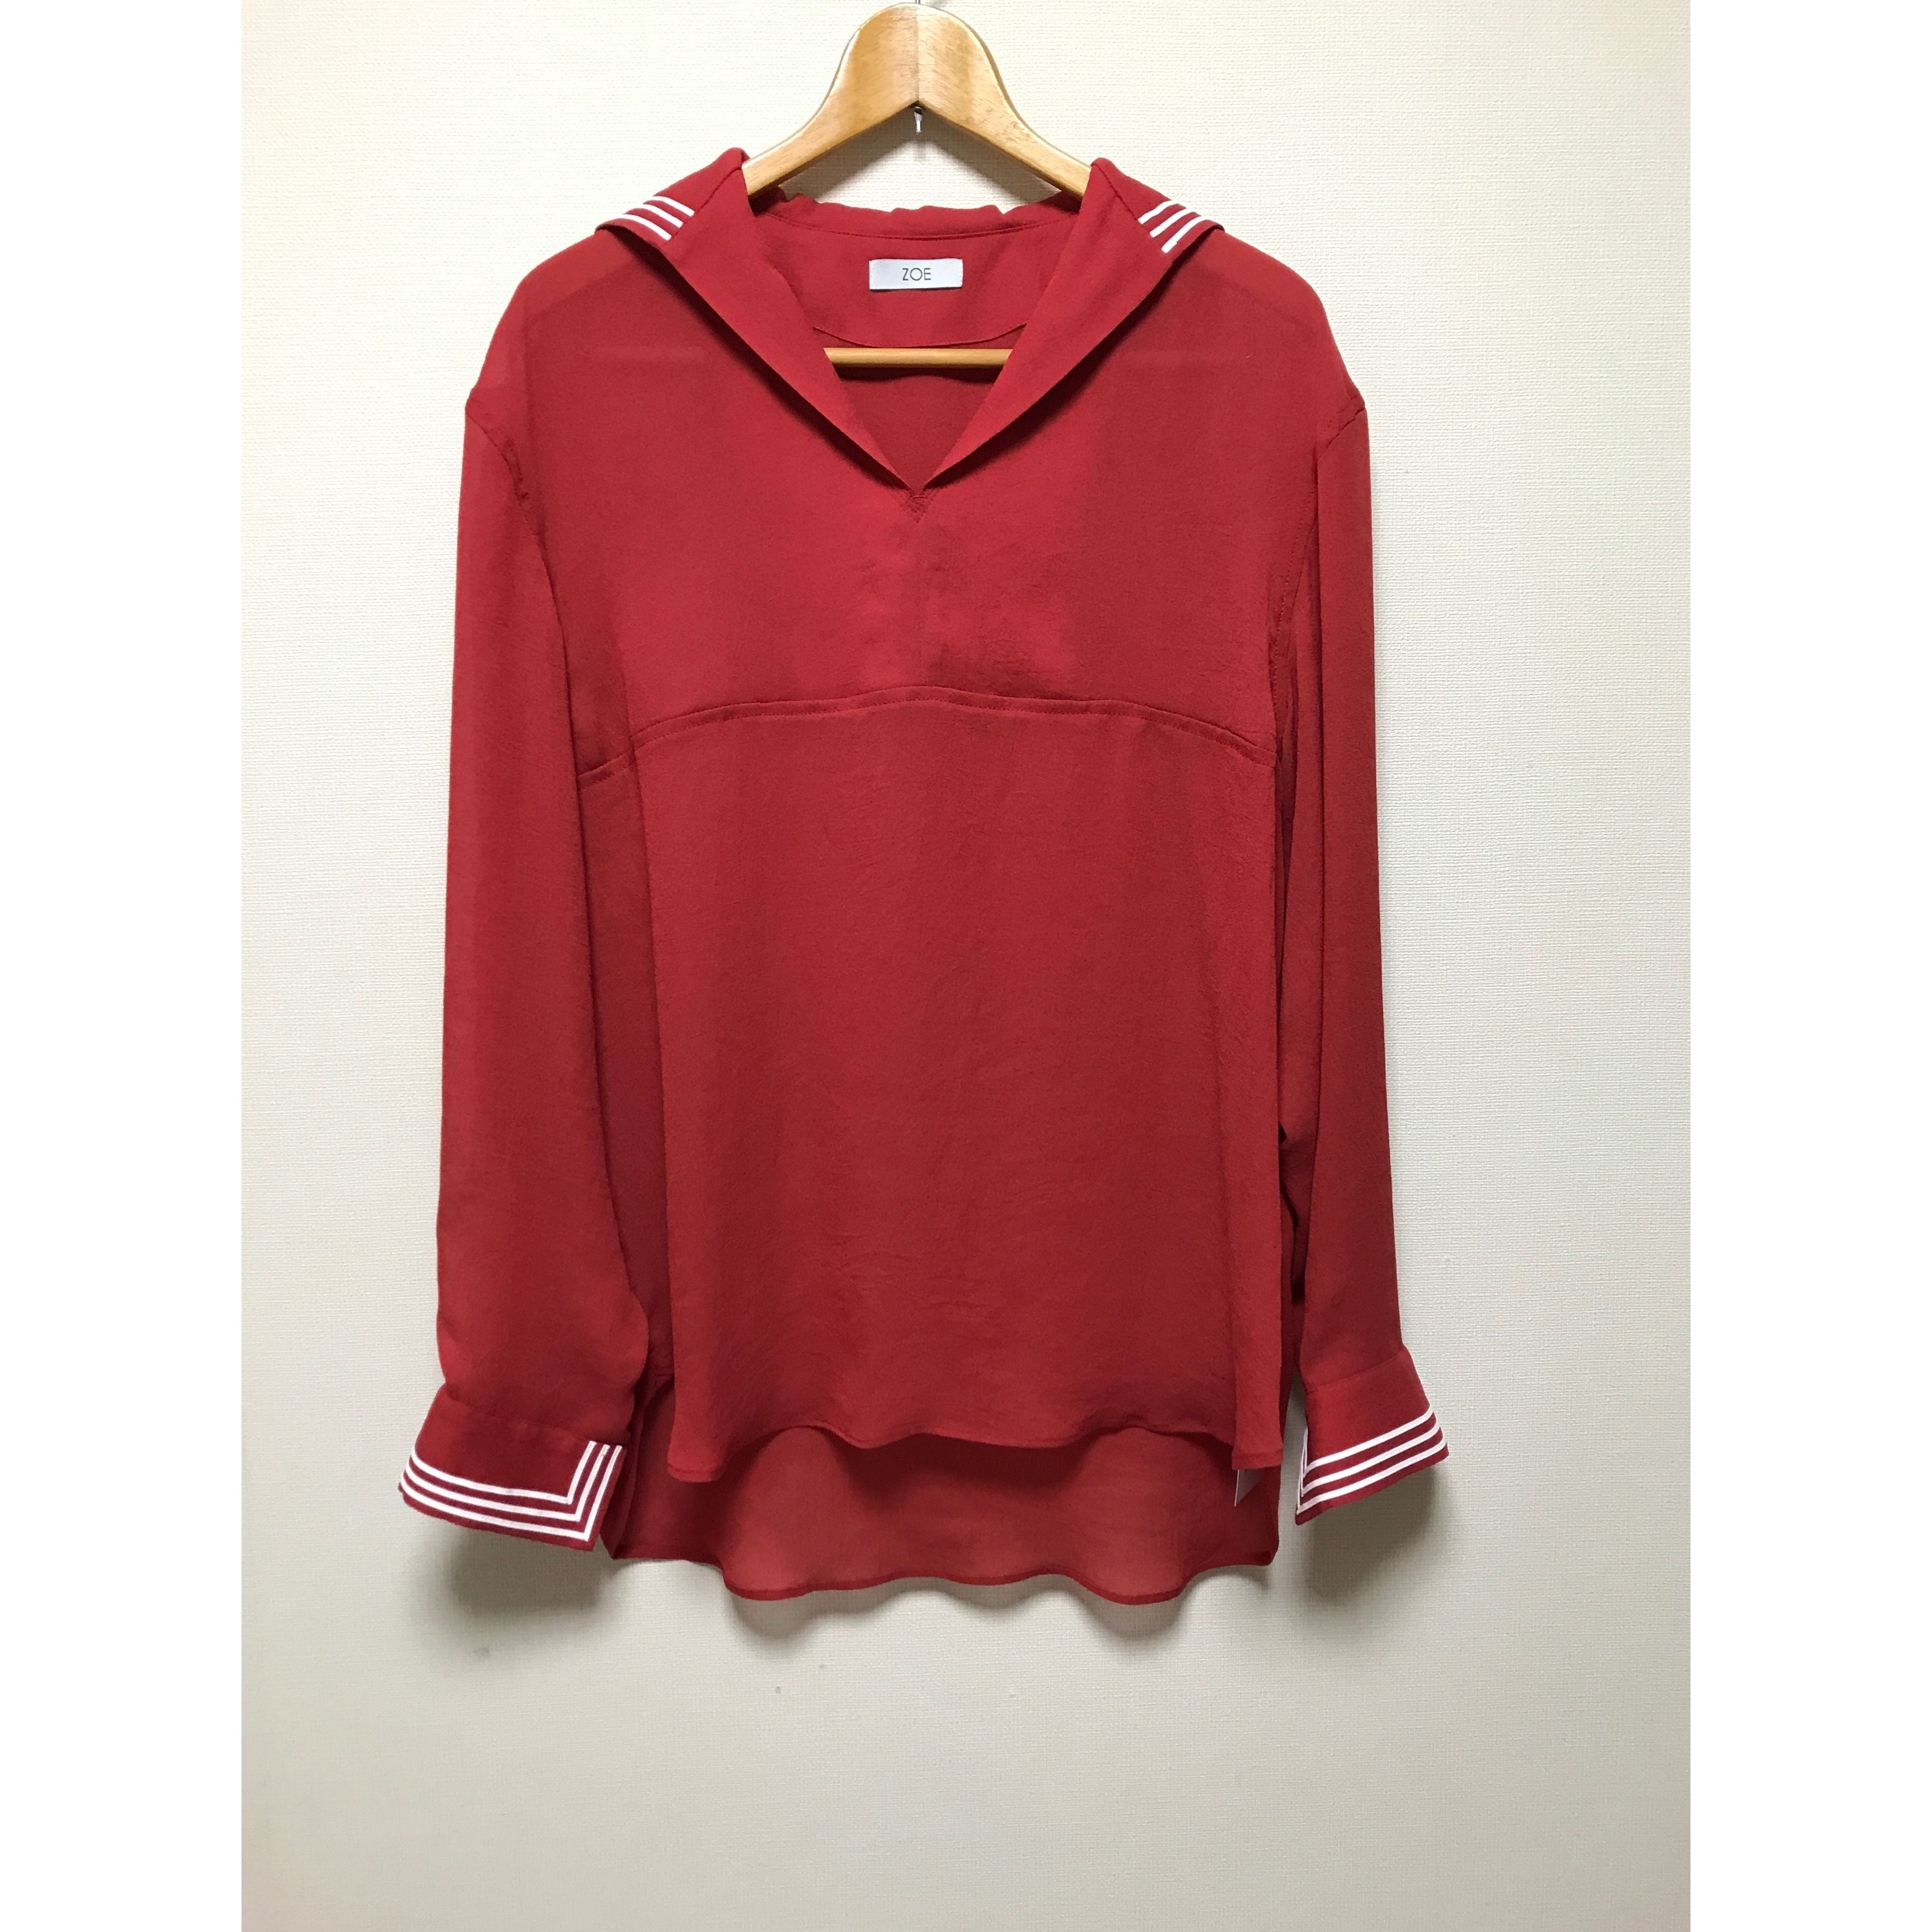 ZOE  セーラーシャツ  Red  sailor  shirt